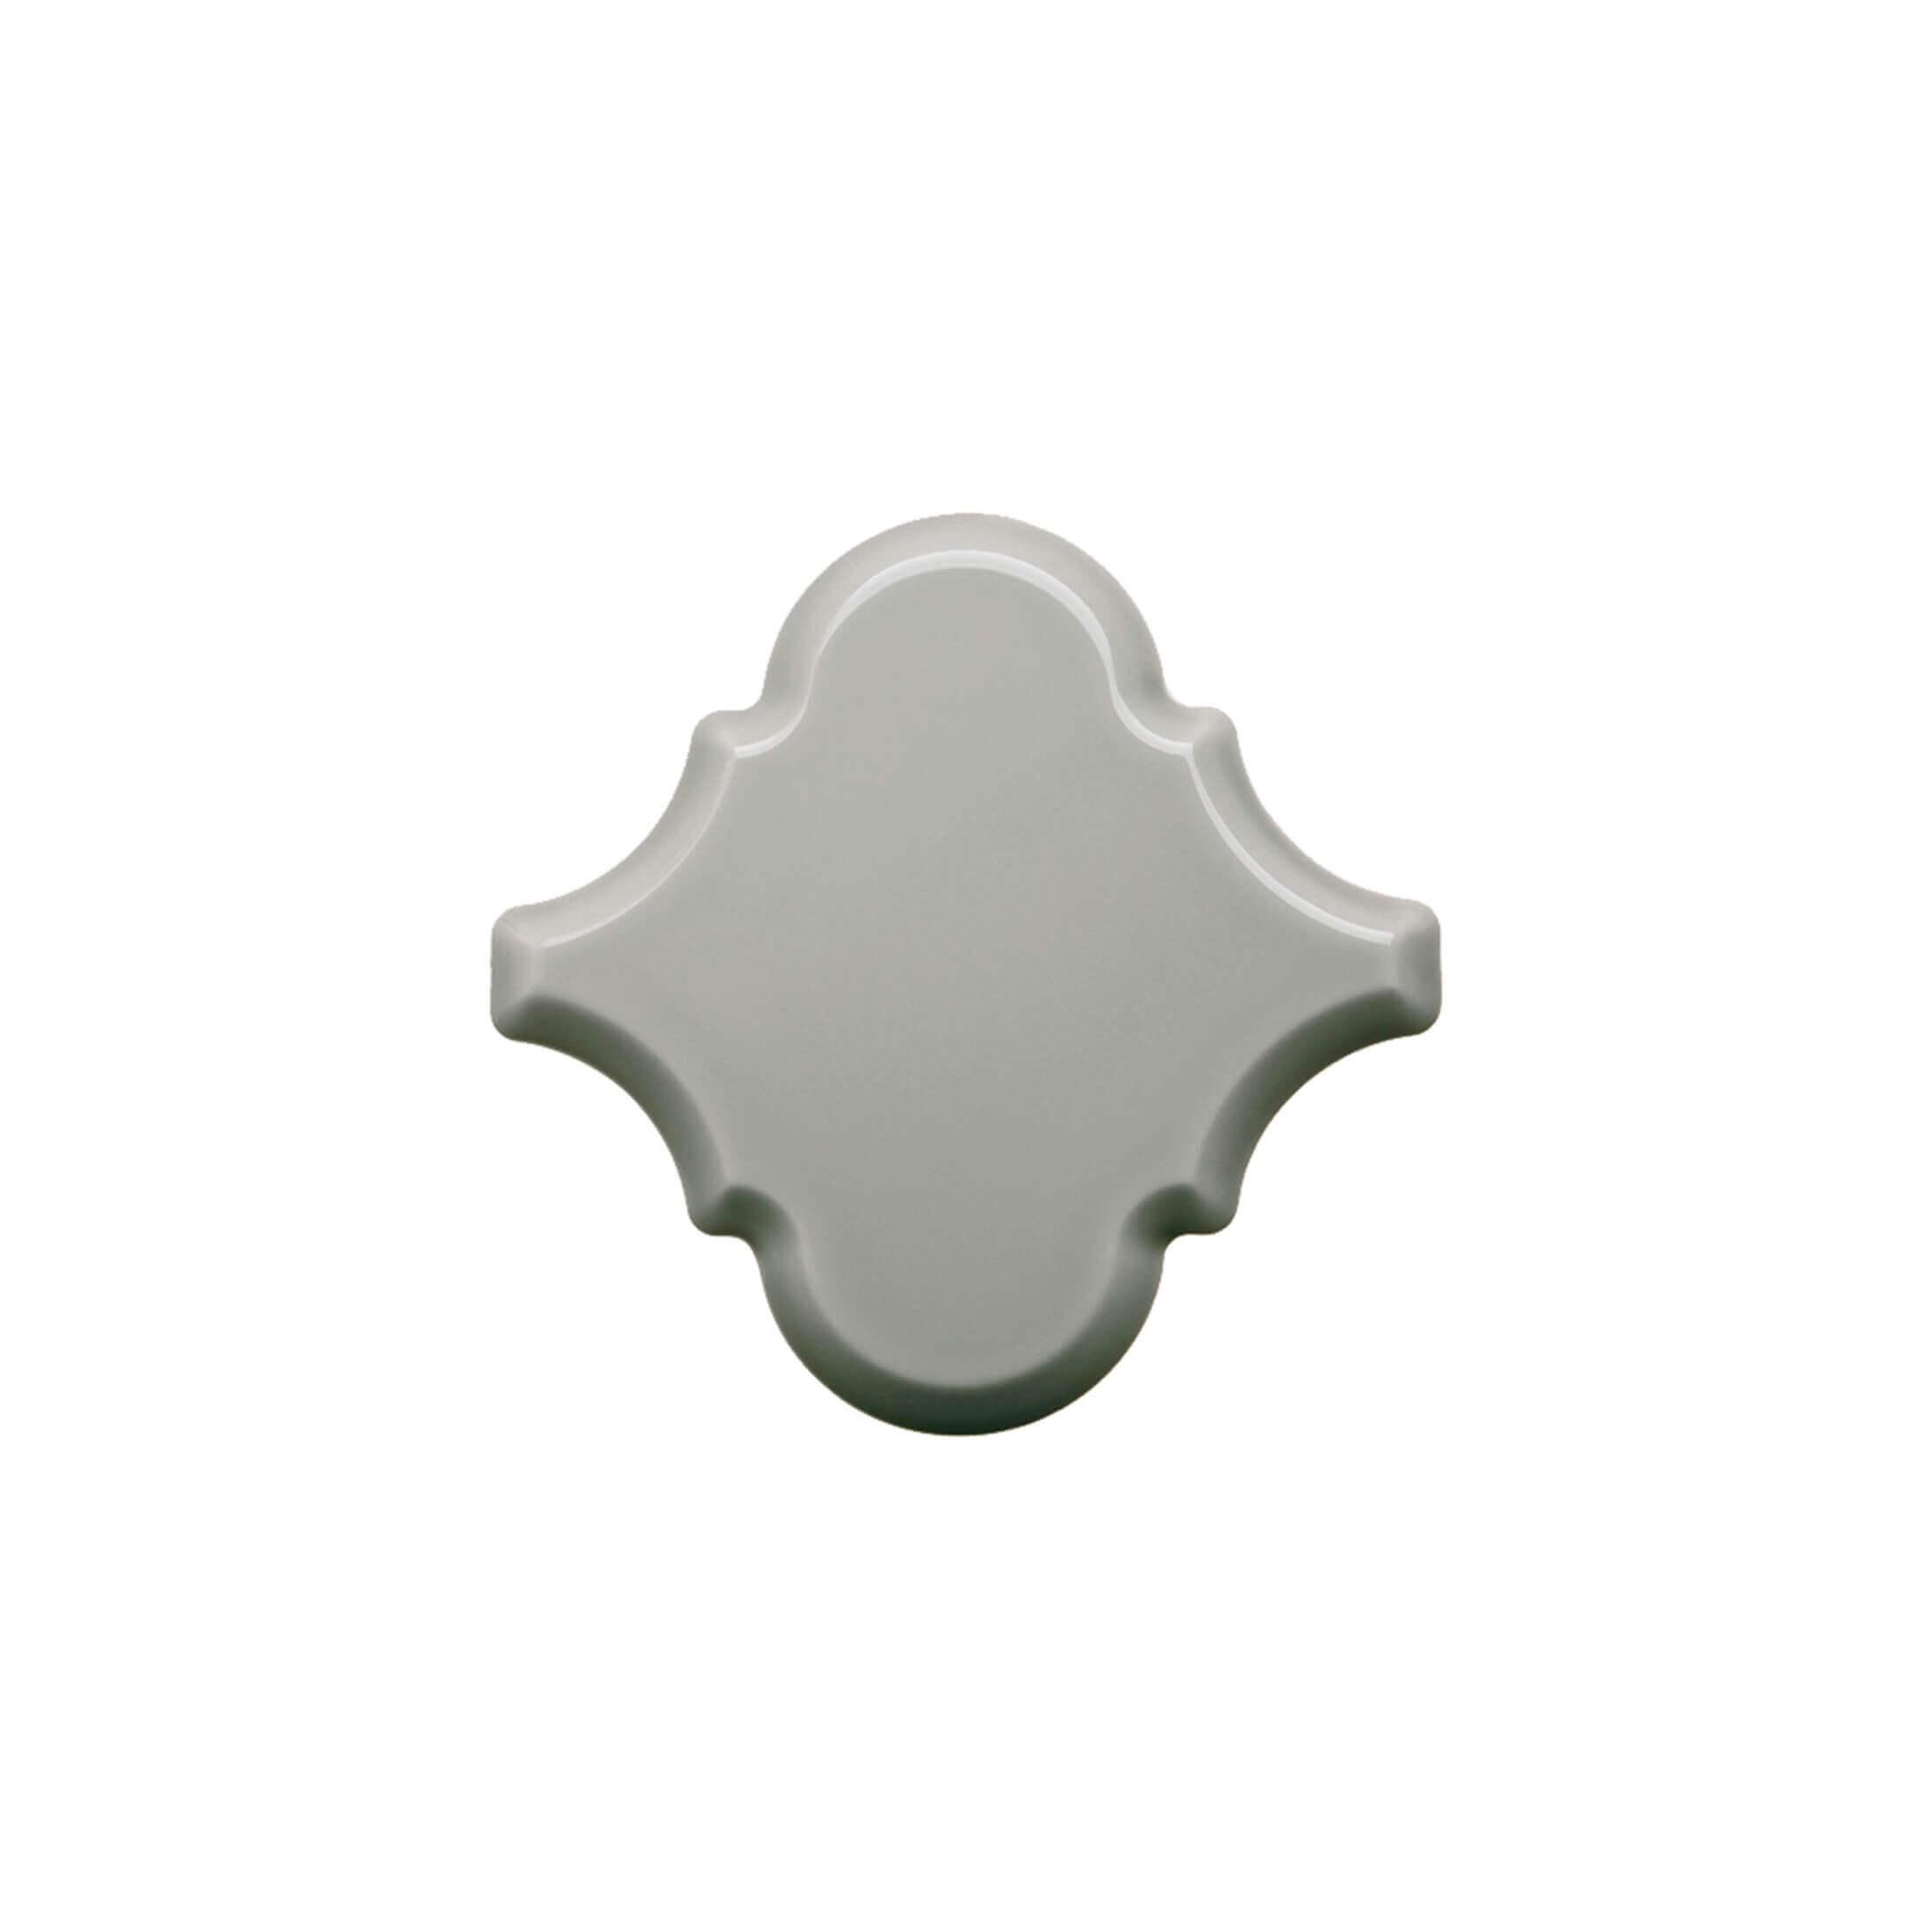 ADST8007 - ARABESCO GRAYSTONE - 15 cm X 15 cm